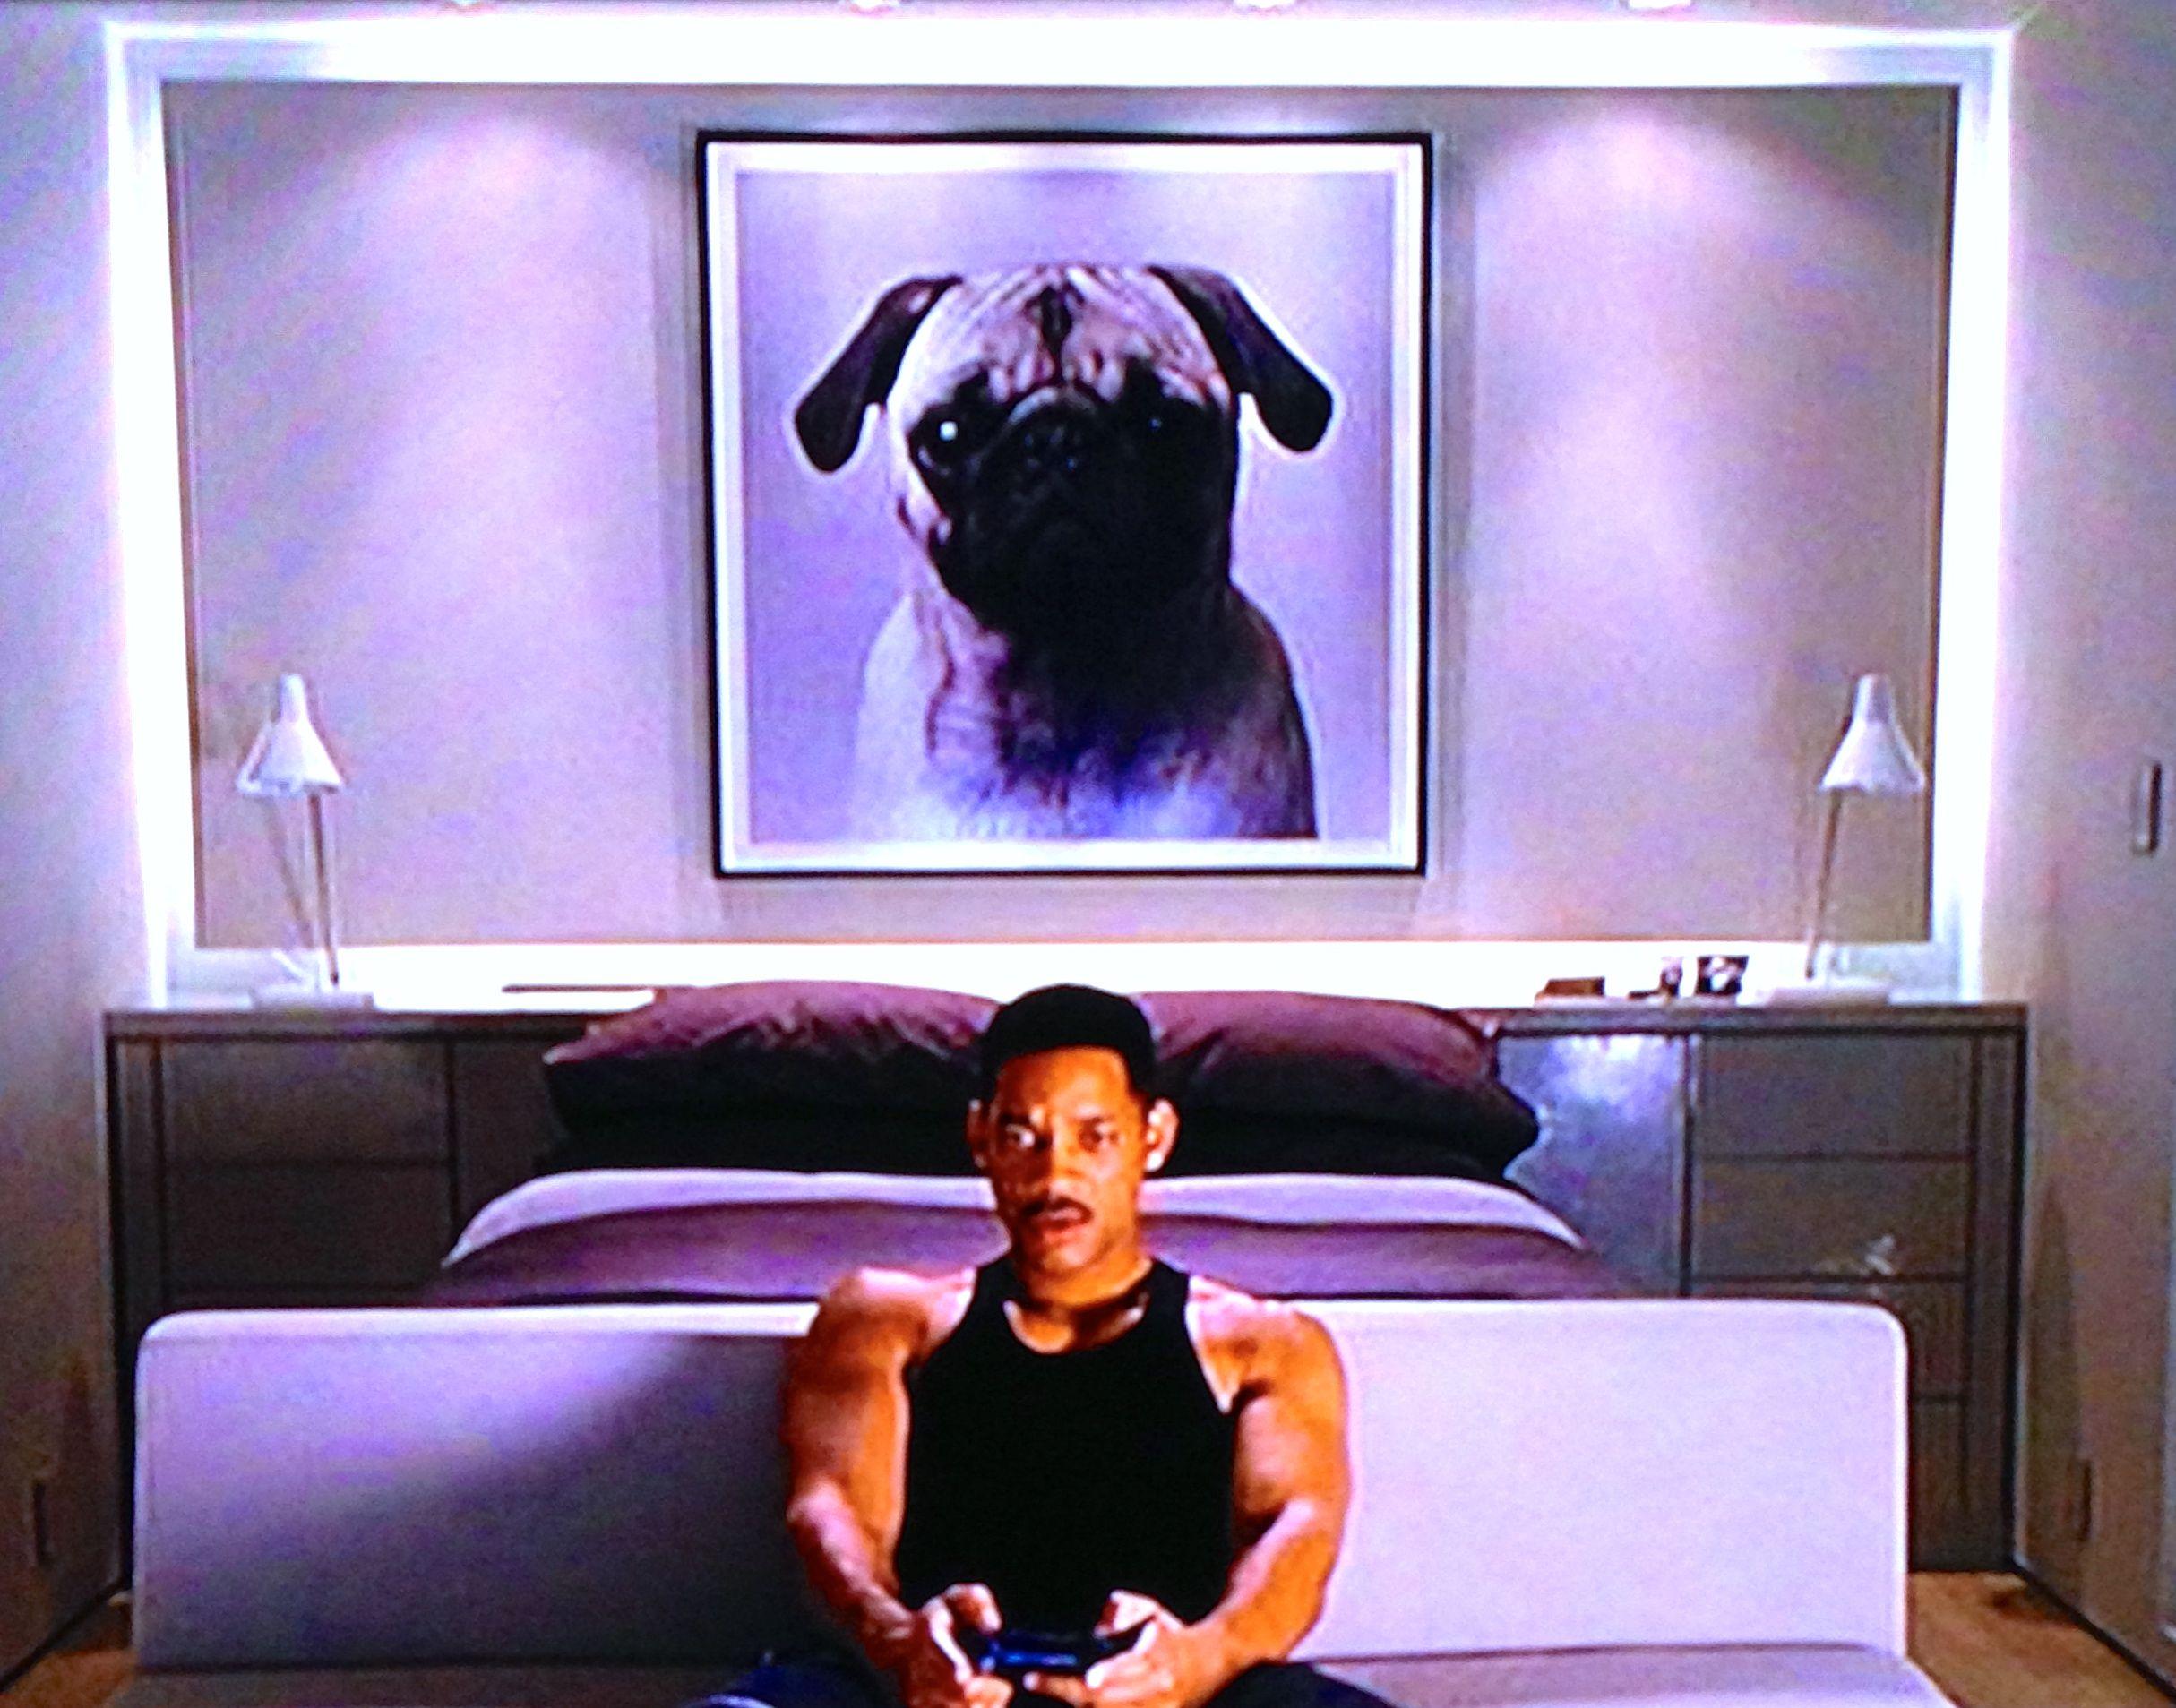 Frank the pug found framed in Men in Black 3 | Frank the pug, Pug love, Pugs